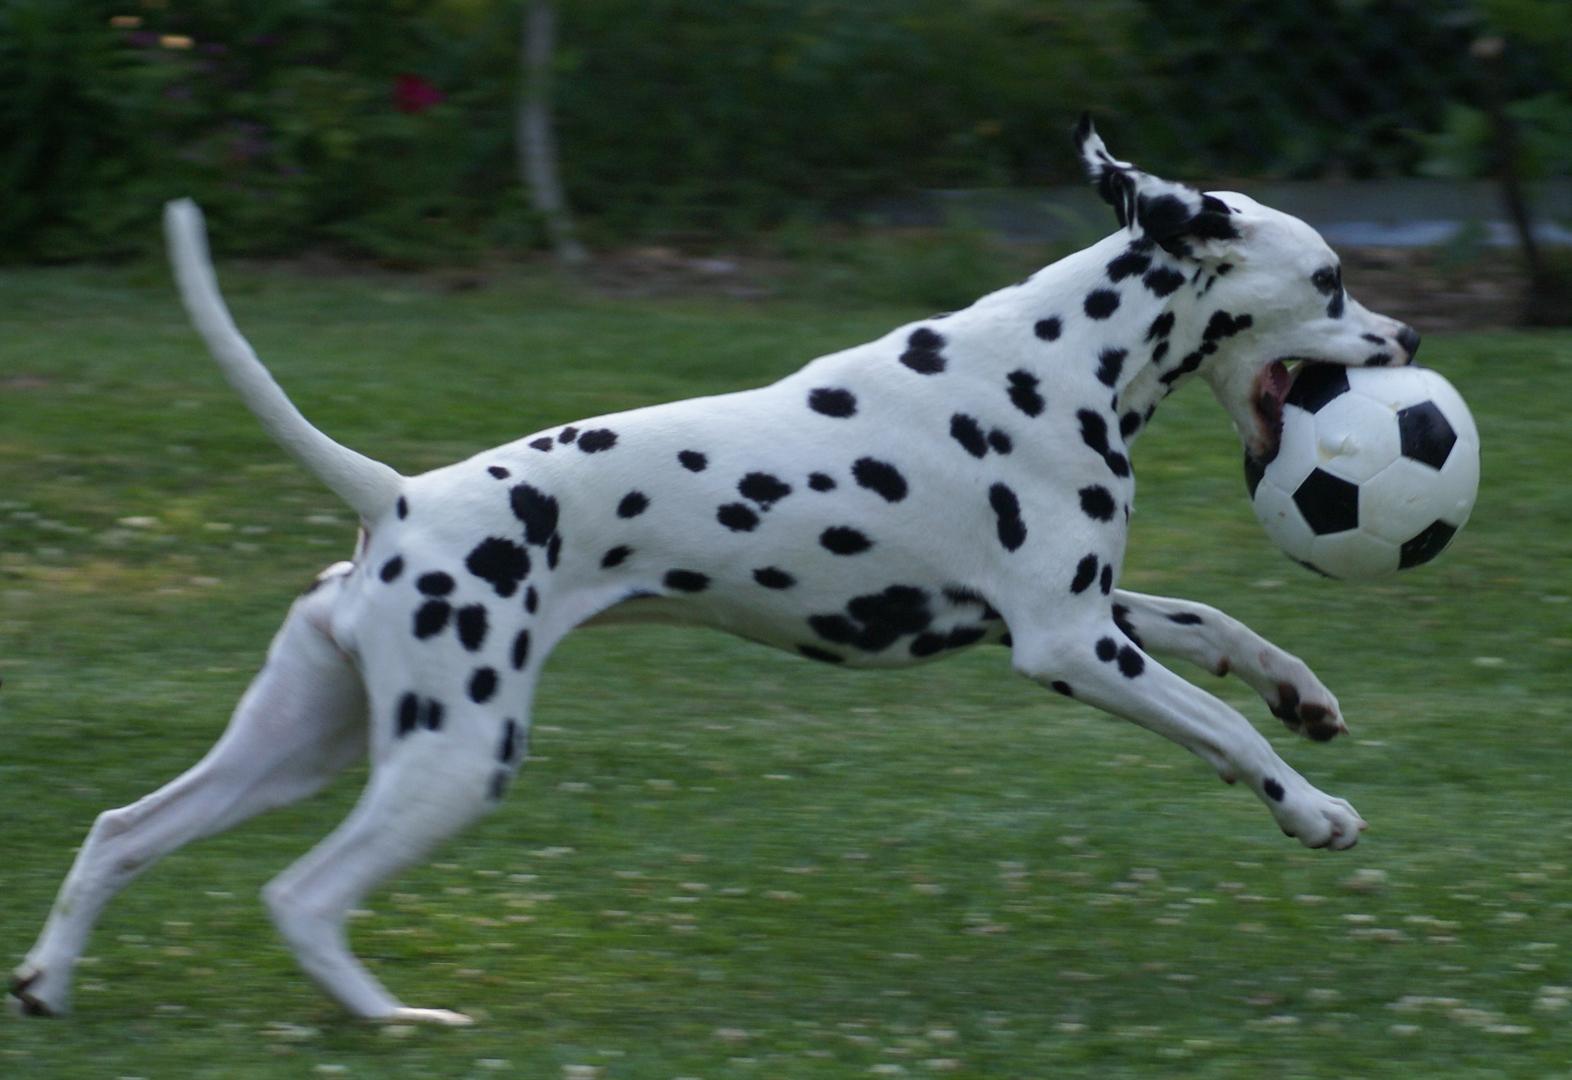 Dalmatian with football ball